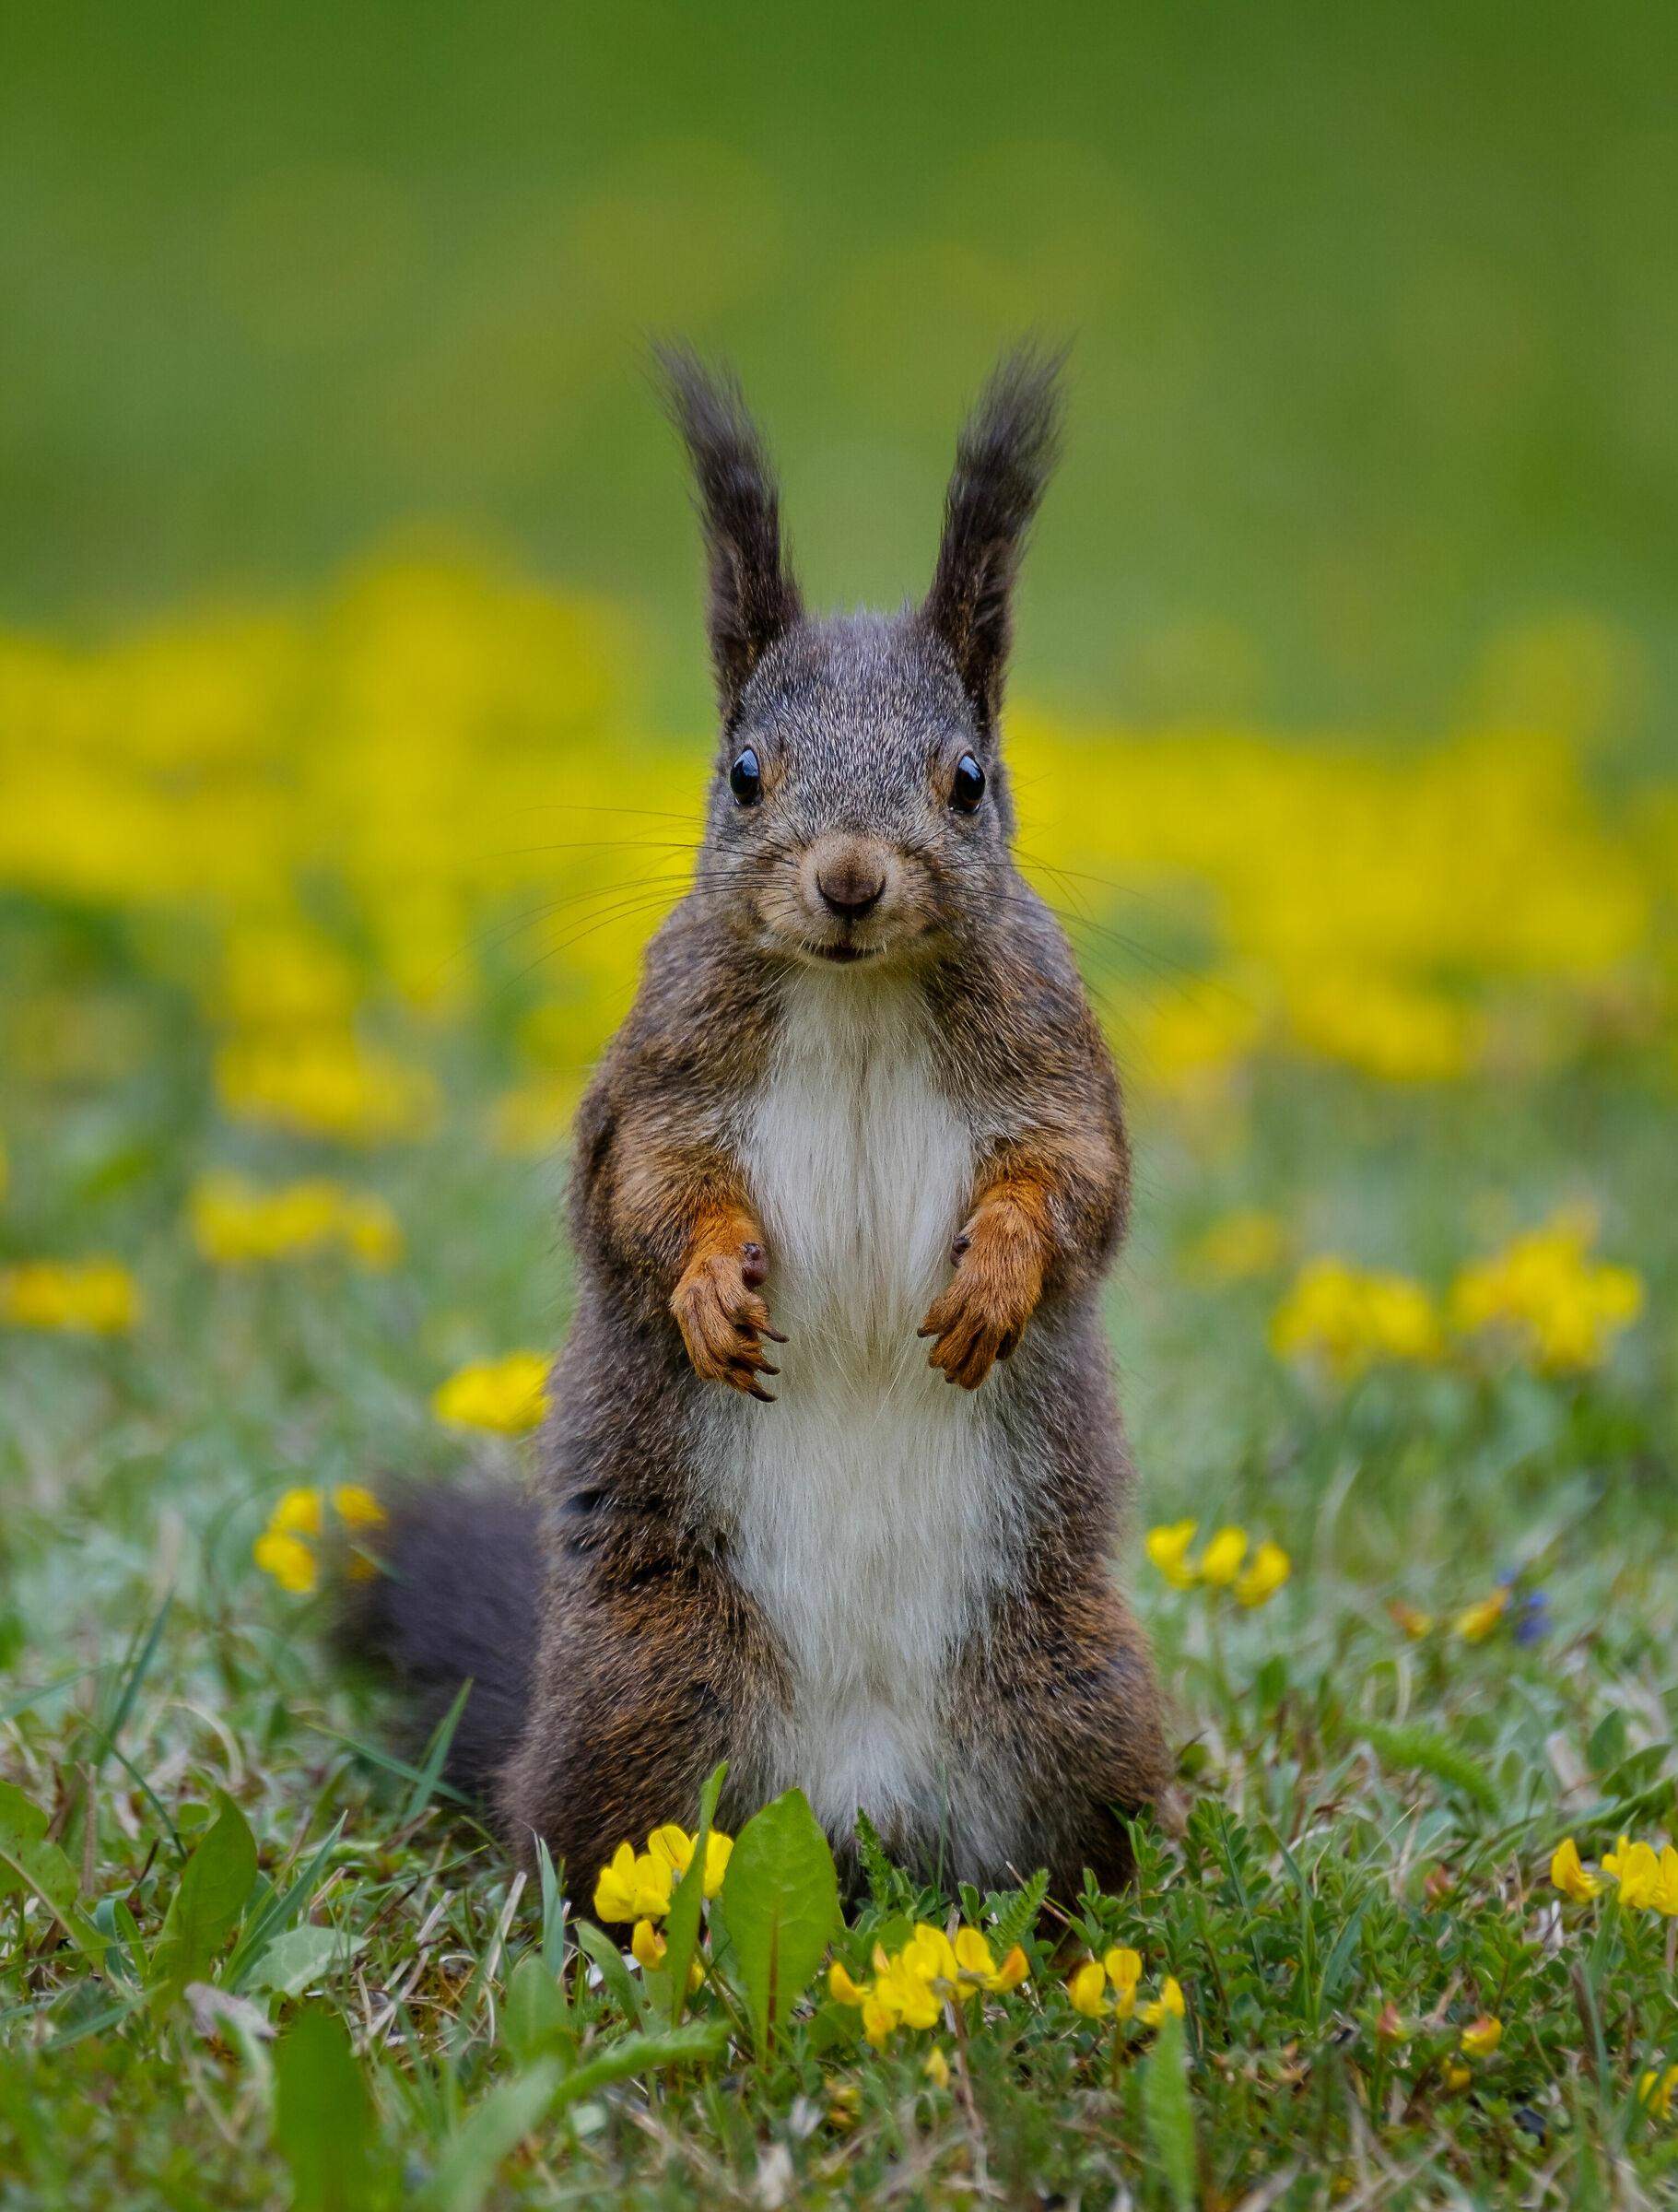 Give me the peanut!...